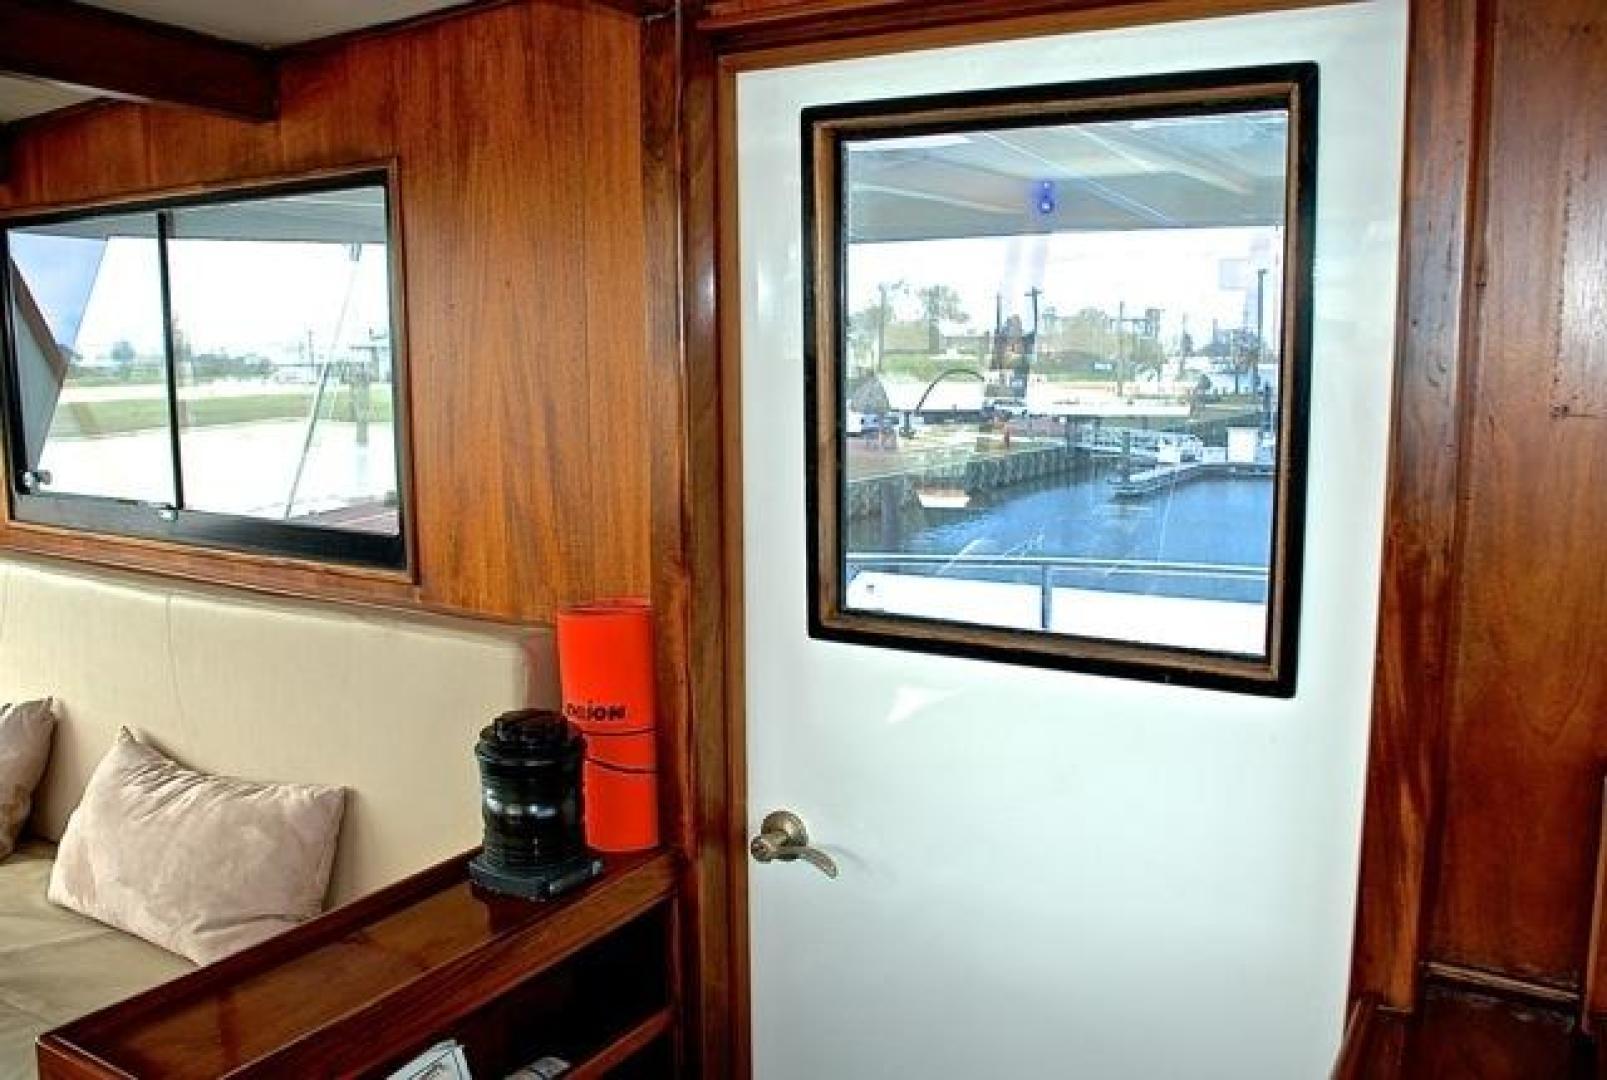 Infinity-Cockpit Motor Yacht 2001-Dont Matter Houston-Texas-United States-Upper Deck Entrance-1005563 | Thumbnail